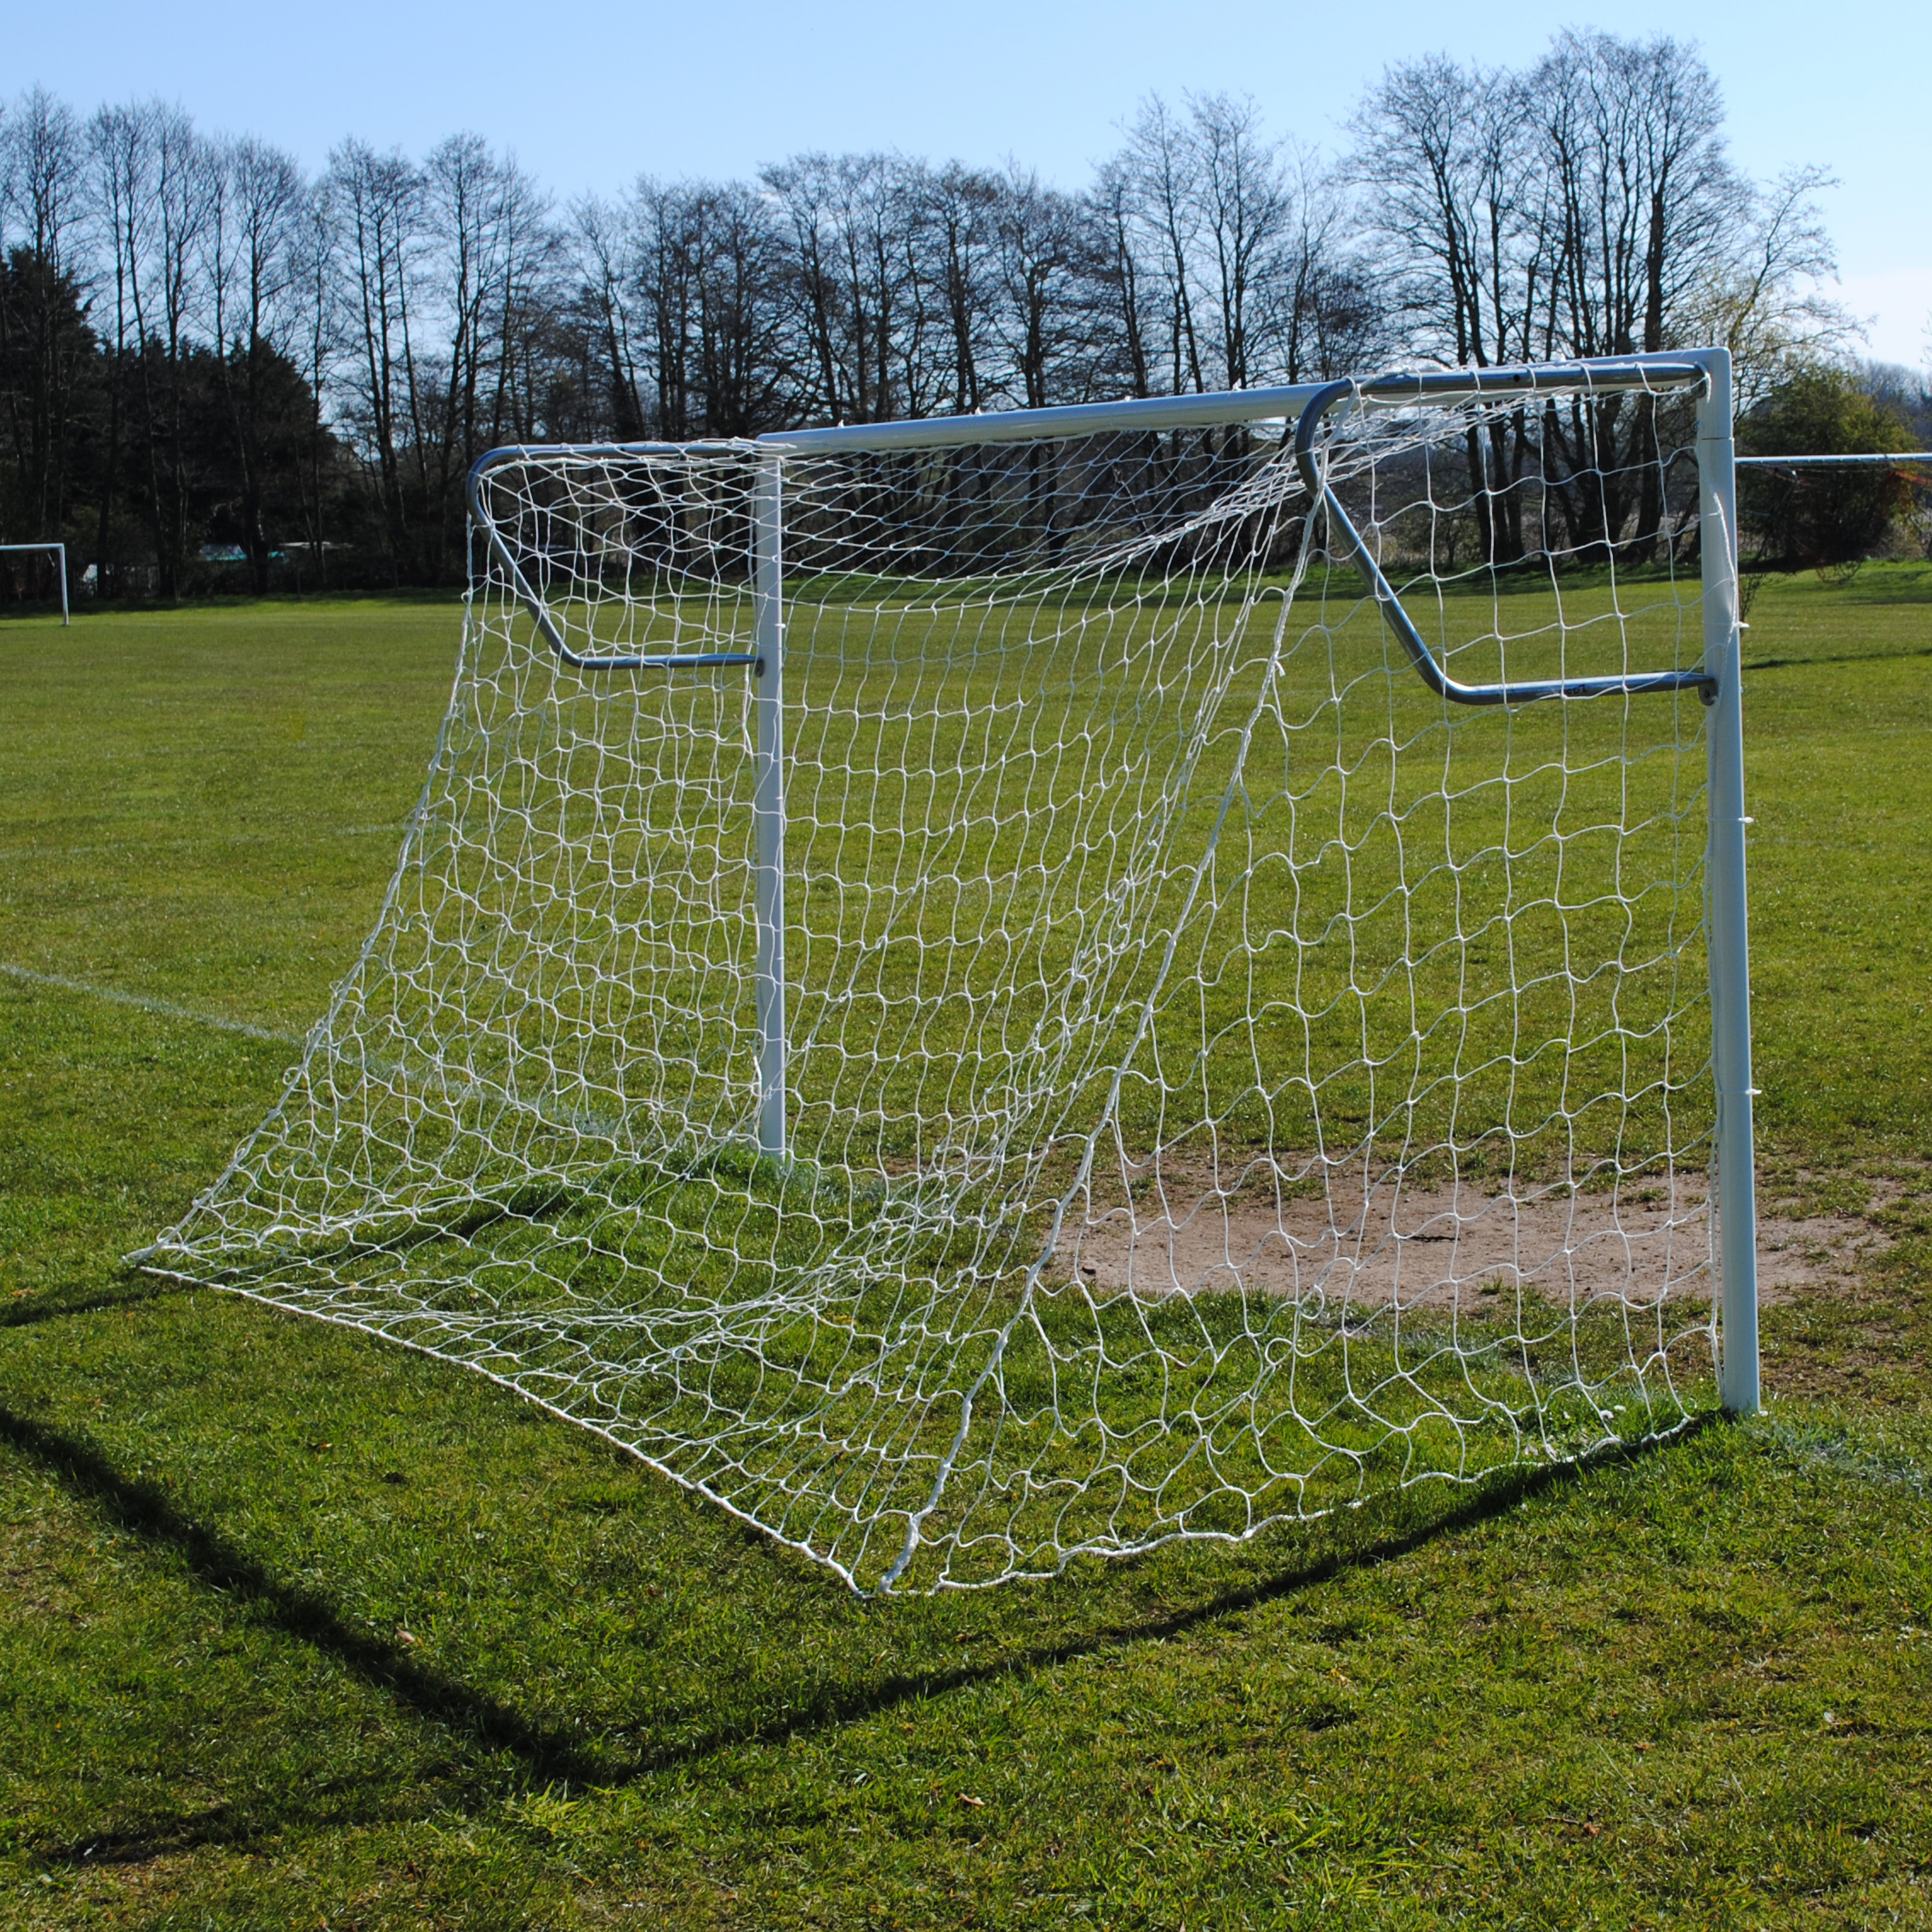 12x6 Heavy Duty 60mm Football 7v7 Goal Package: Mini Soccer Socketed Steel